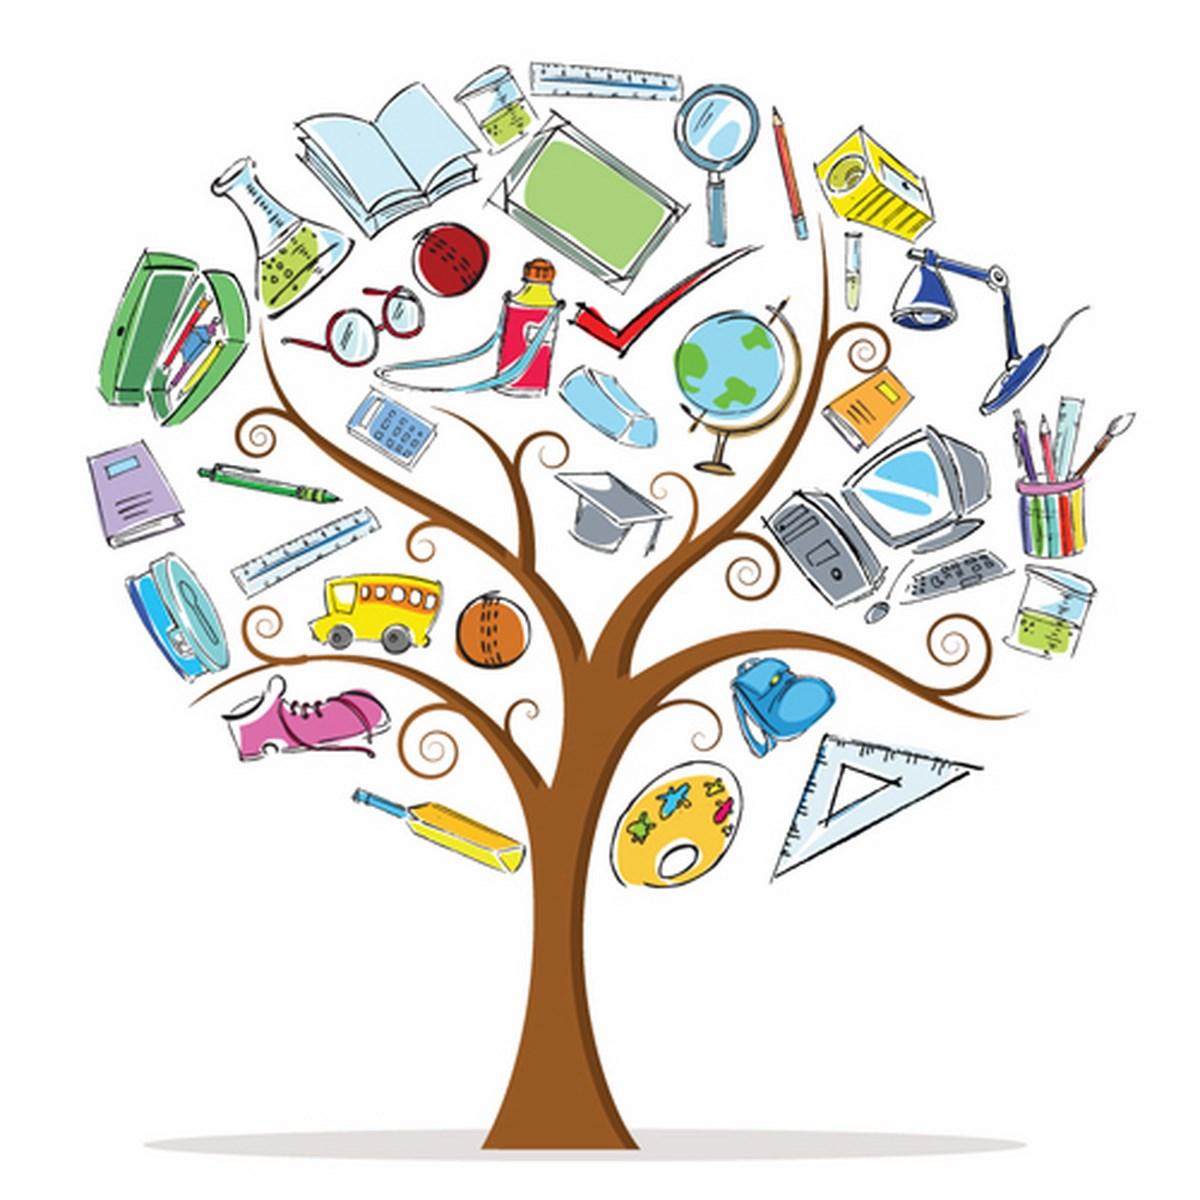 https://blogs.sch.gr/1dimskiath/2015/05/31 παρουσίαση-προγραμμάτων-σχολικών-δρ/